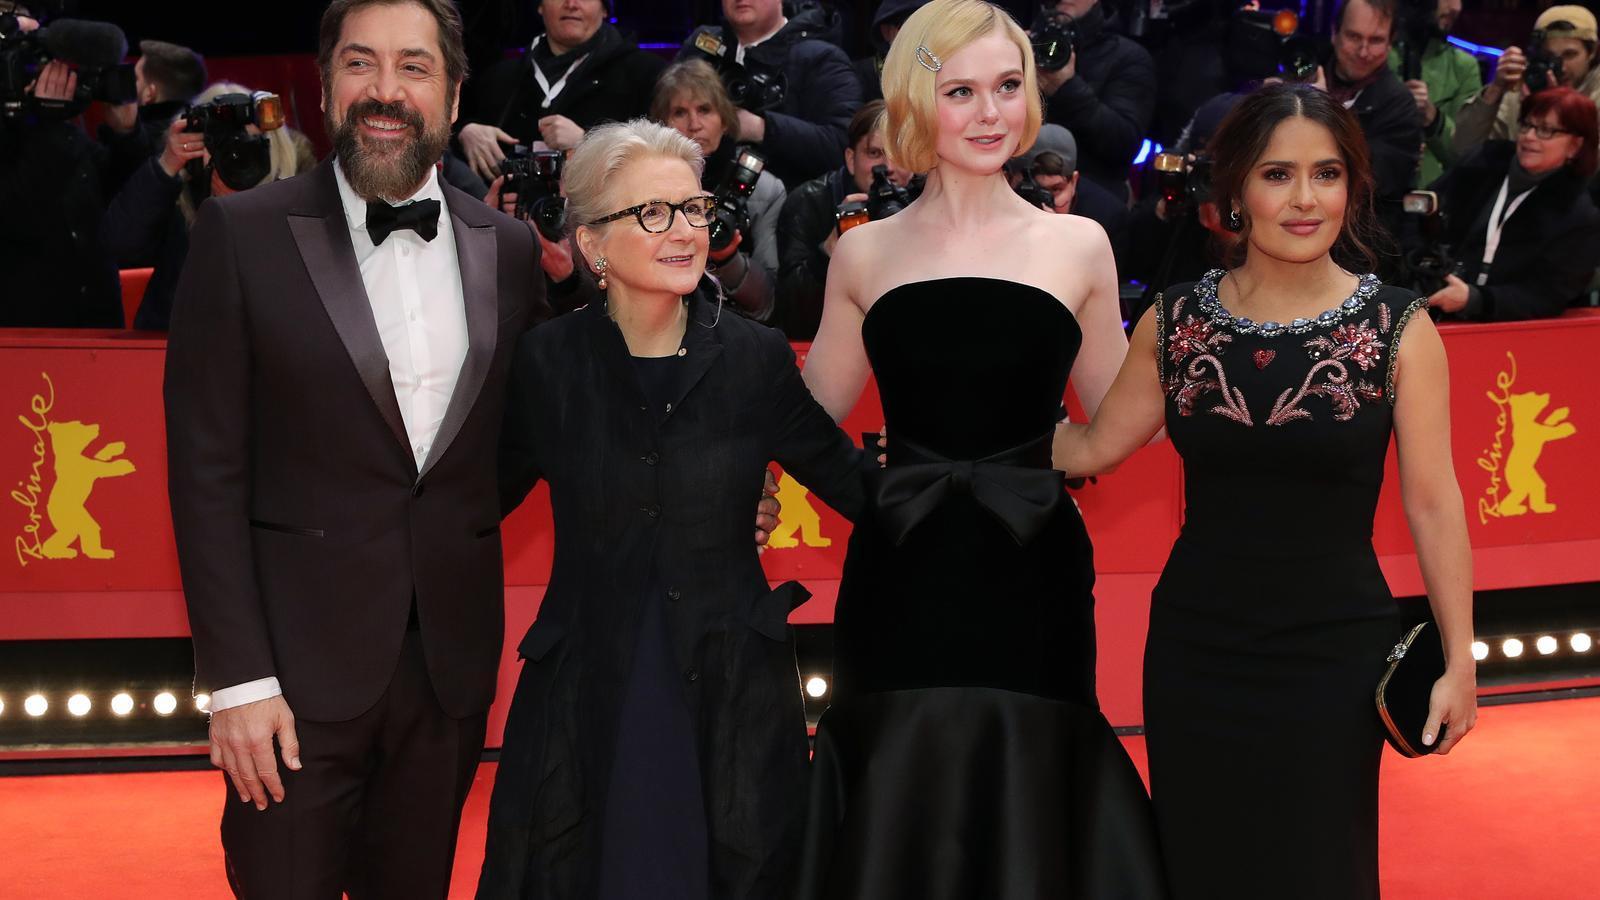 L'actor Javier Bardem, la directora Sally Potter i les actrius Elle Fanning i Salma Hayek al 70è Festival Internacional de Cinema de Berlín